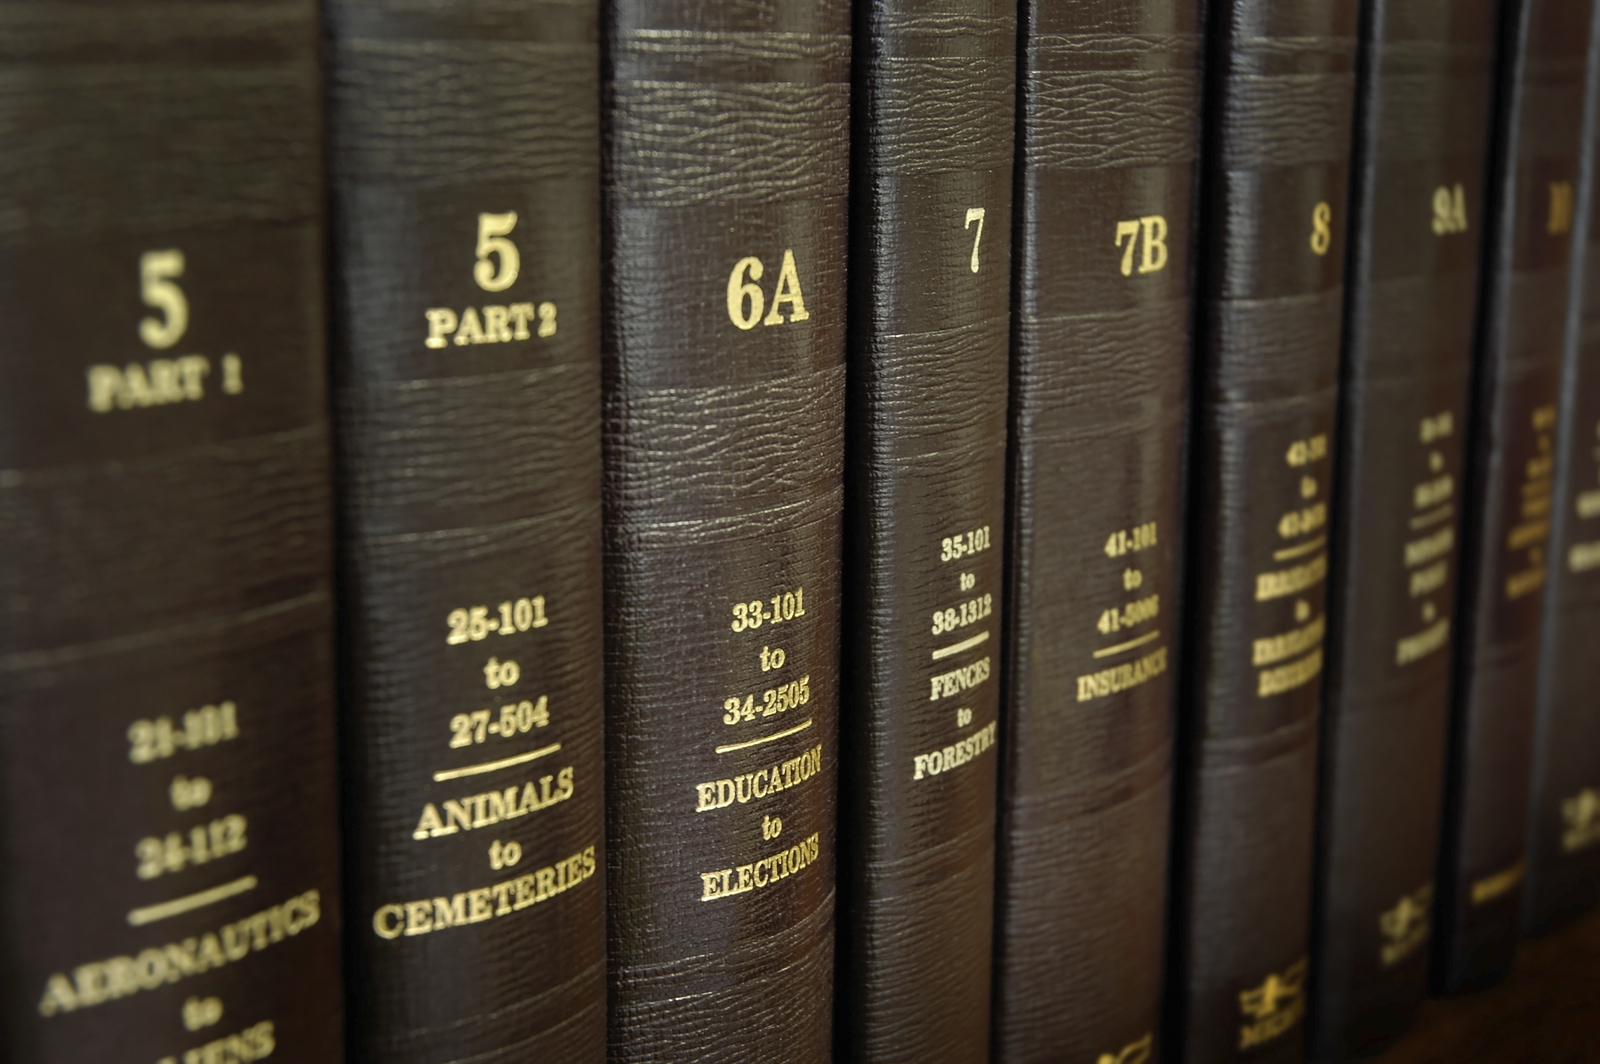 bigstock-Law-Books-2255355.jpg